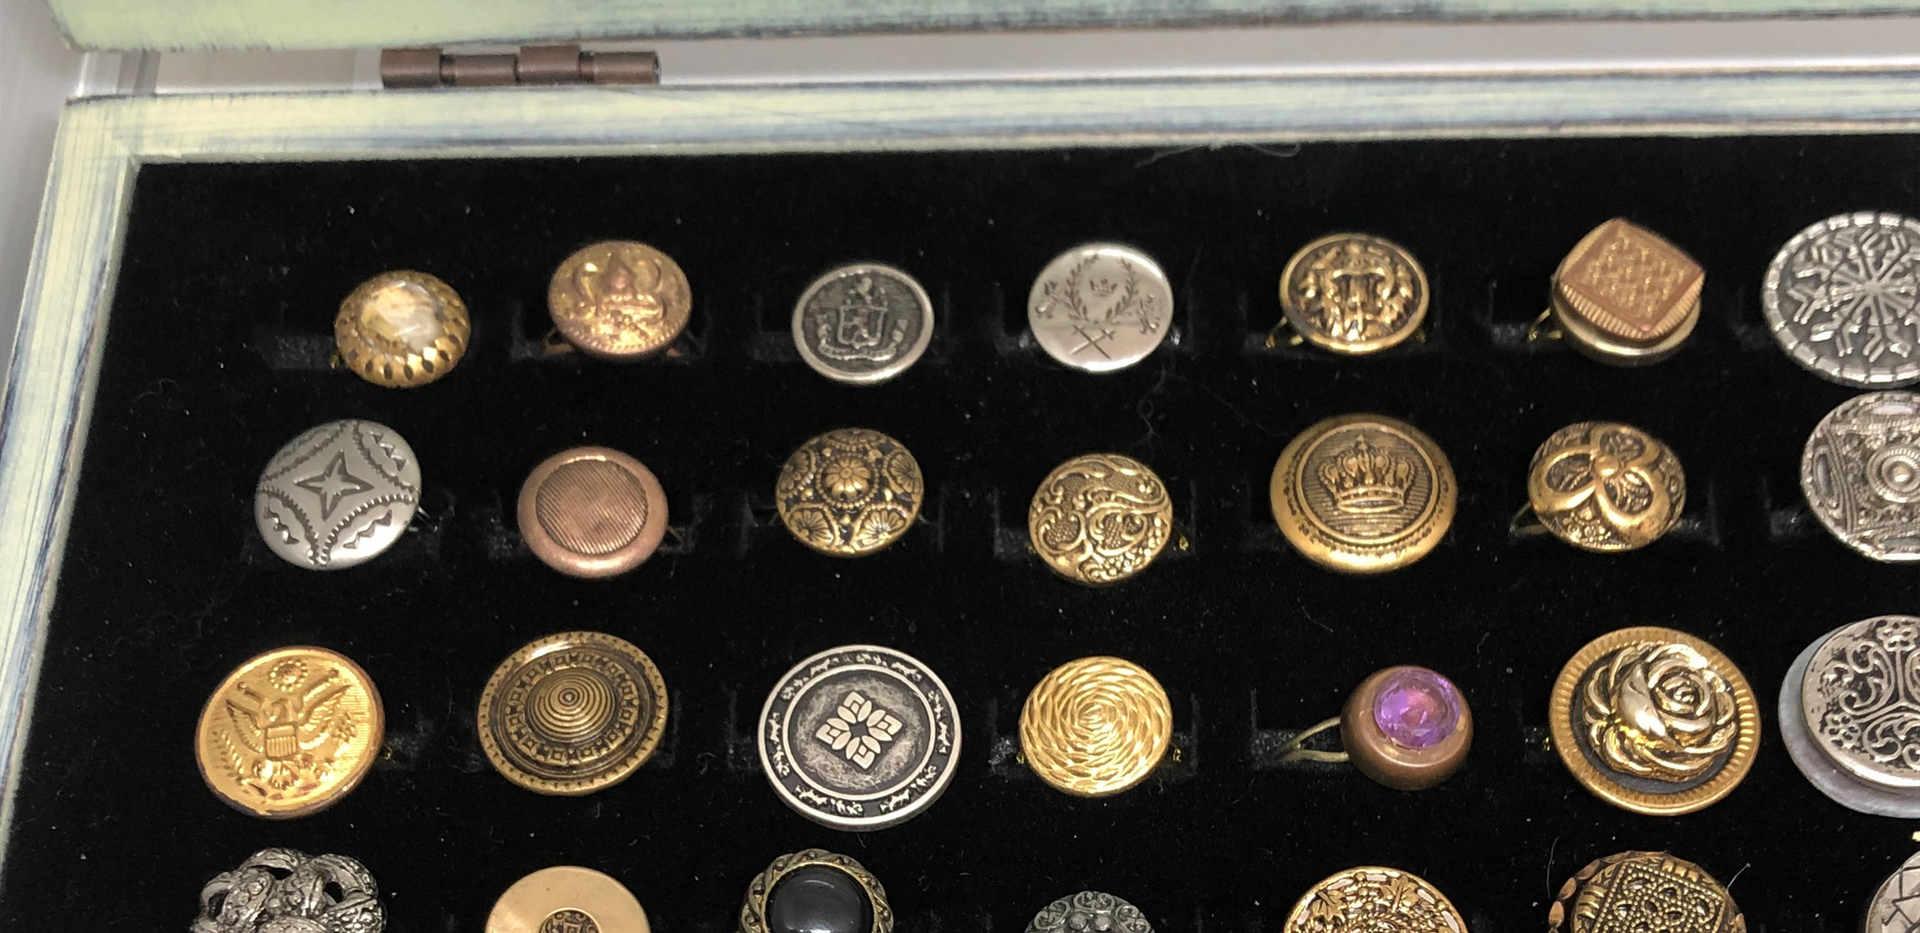 Vintage metal button rings